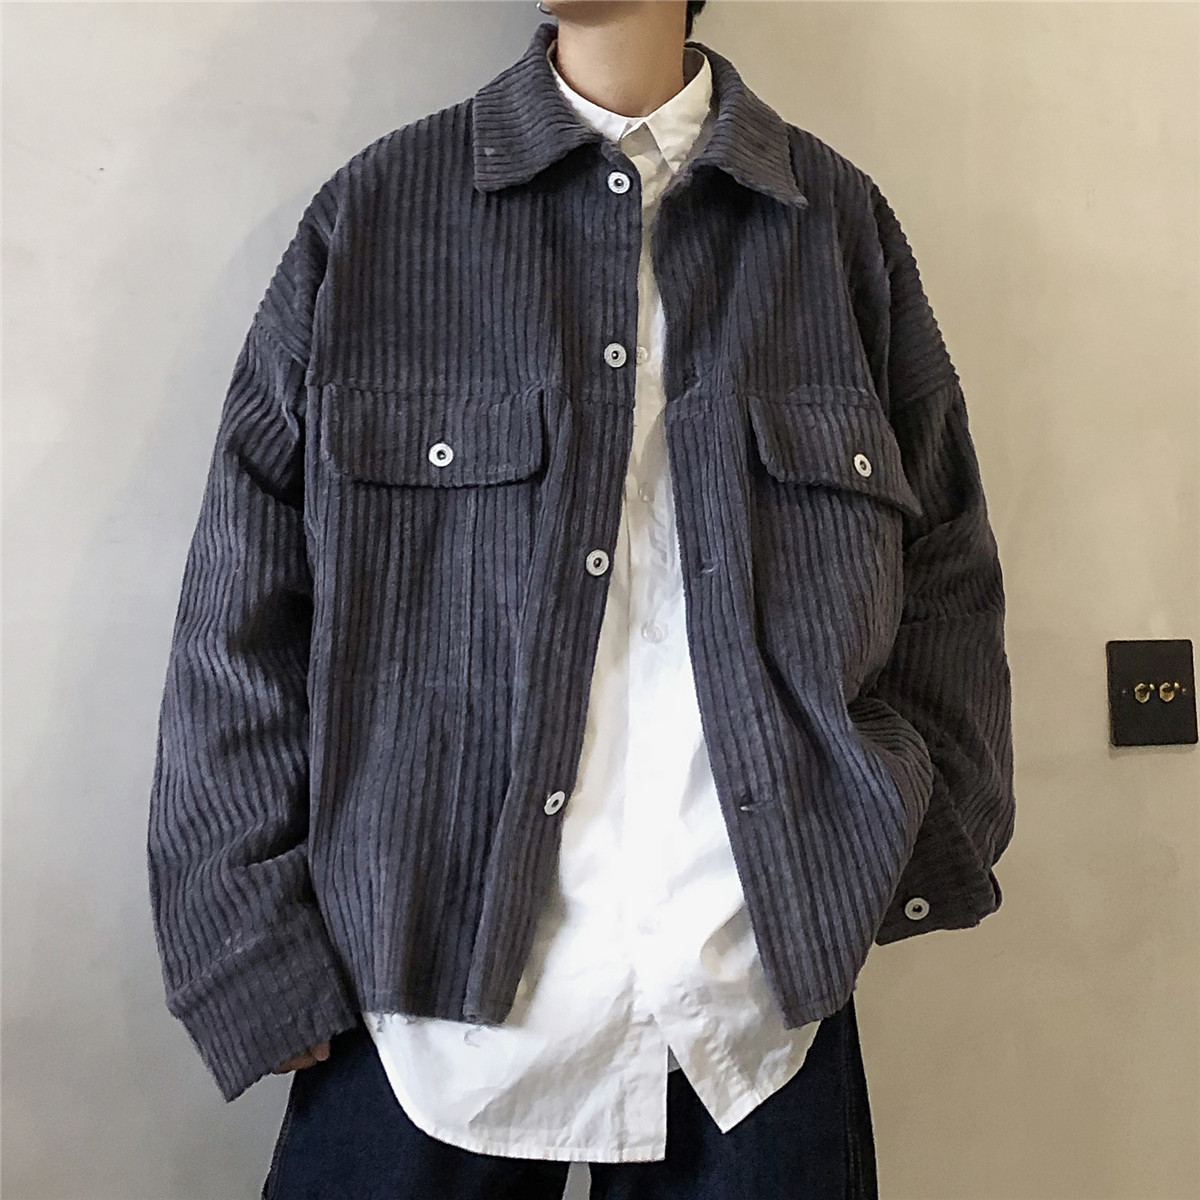 2019 Men's Corduroy Fabric Coats Streetwear Brand Bomber Jackets Fashion Outerwear Grey/red/khaki Color Windbreaker Size M-XL